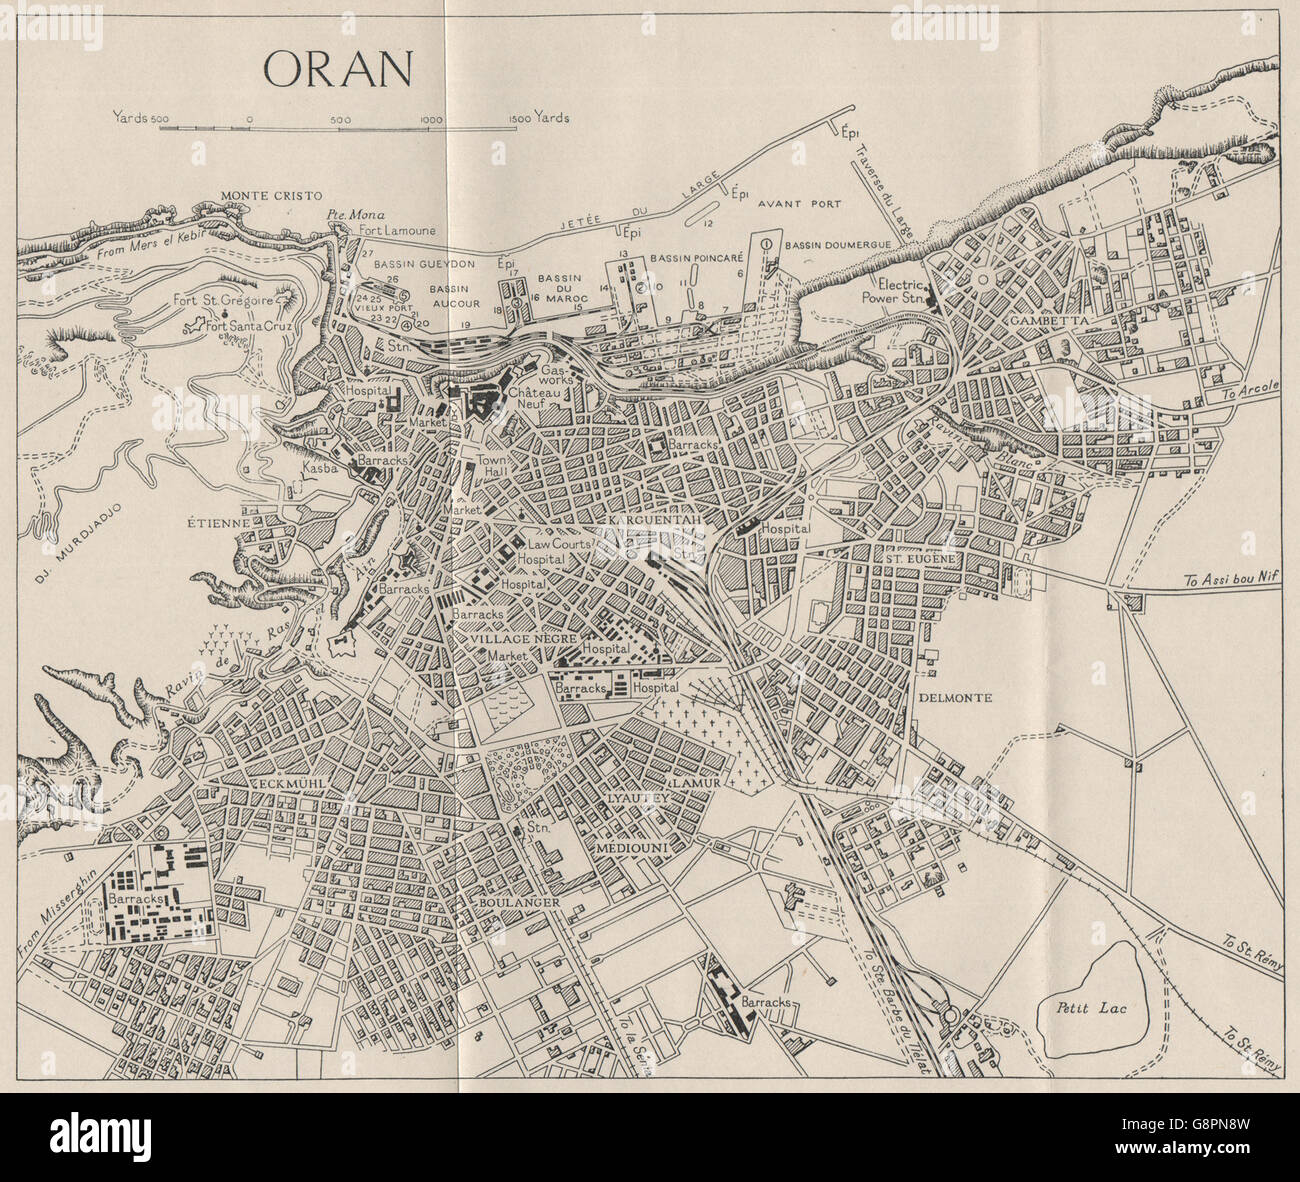 ORAN: Town Plan. Algeria. WW2 ROYAL NAVY INTELLIGENCE MAP